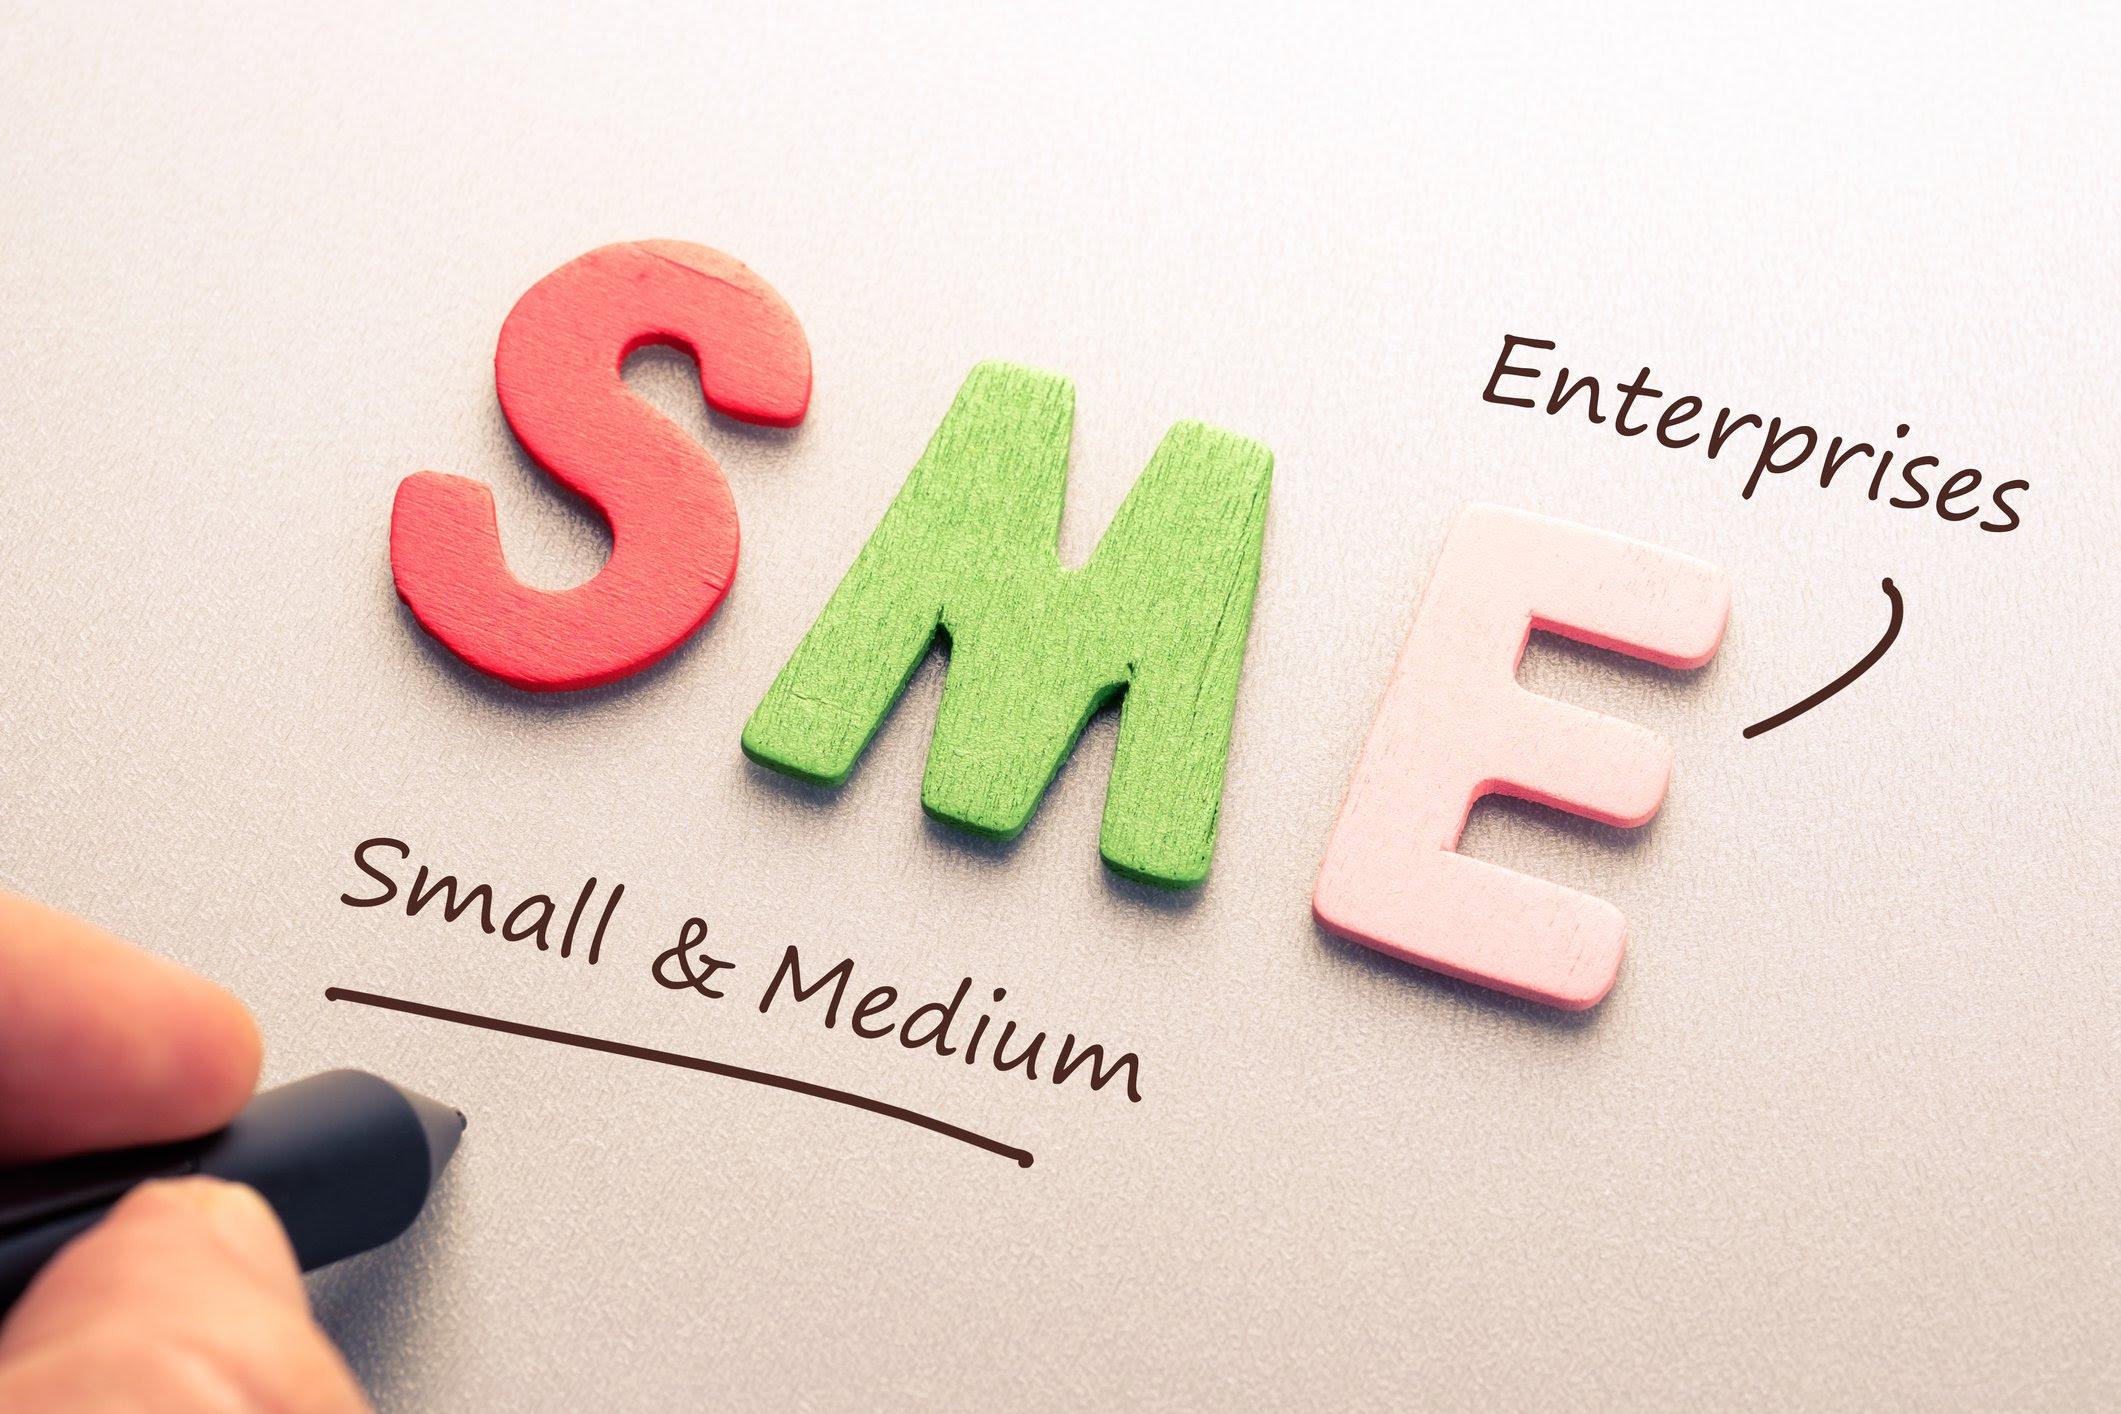 SMEs As the Key to Unlock Nigeria's Economic Potentials